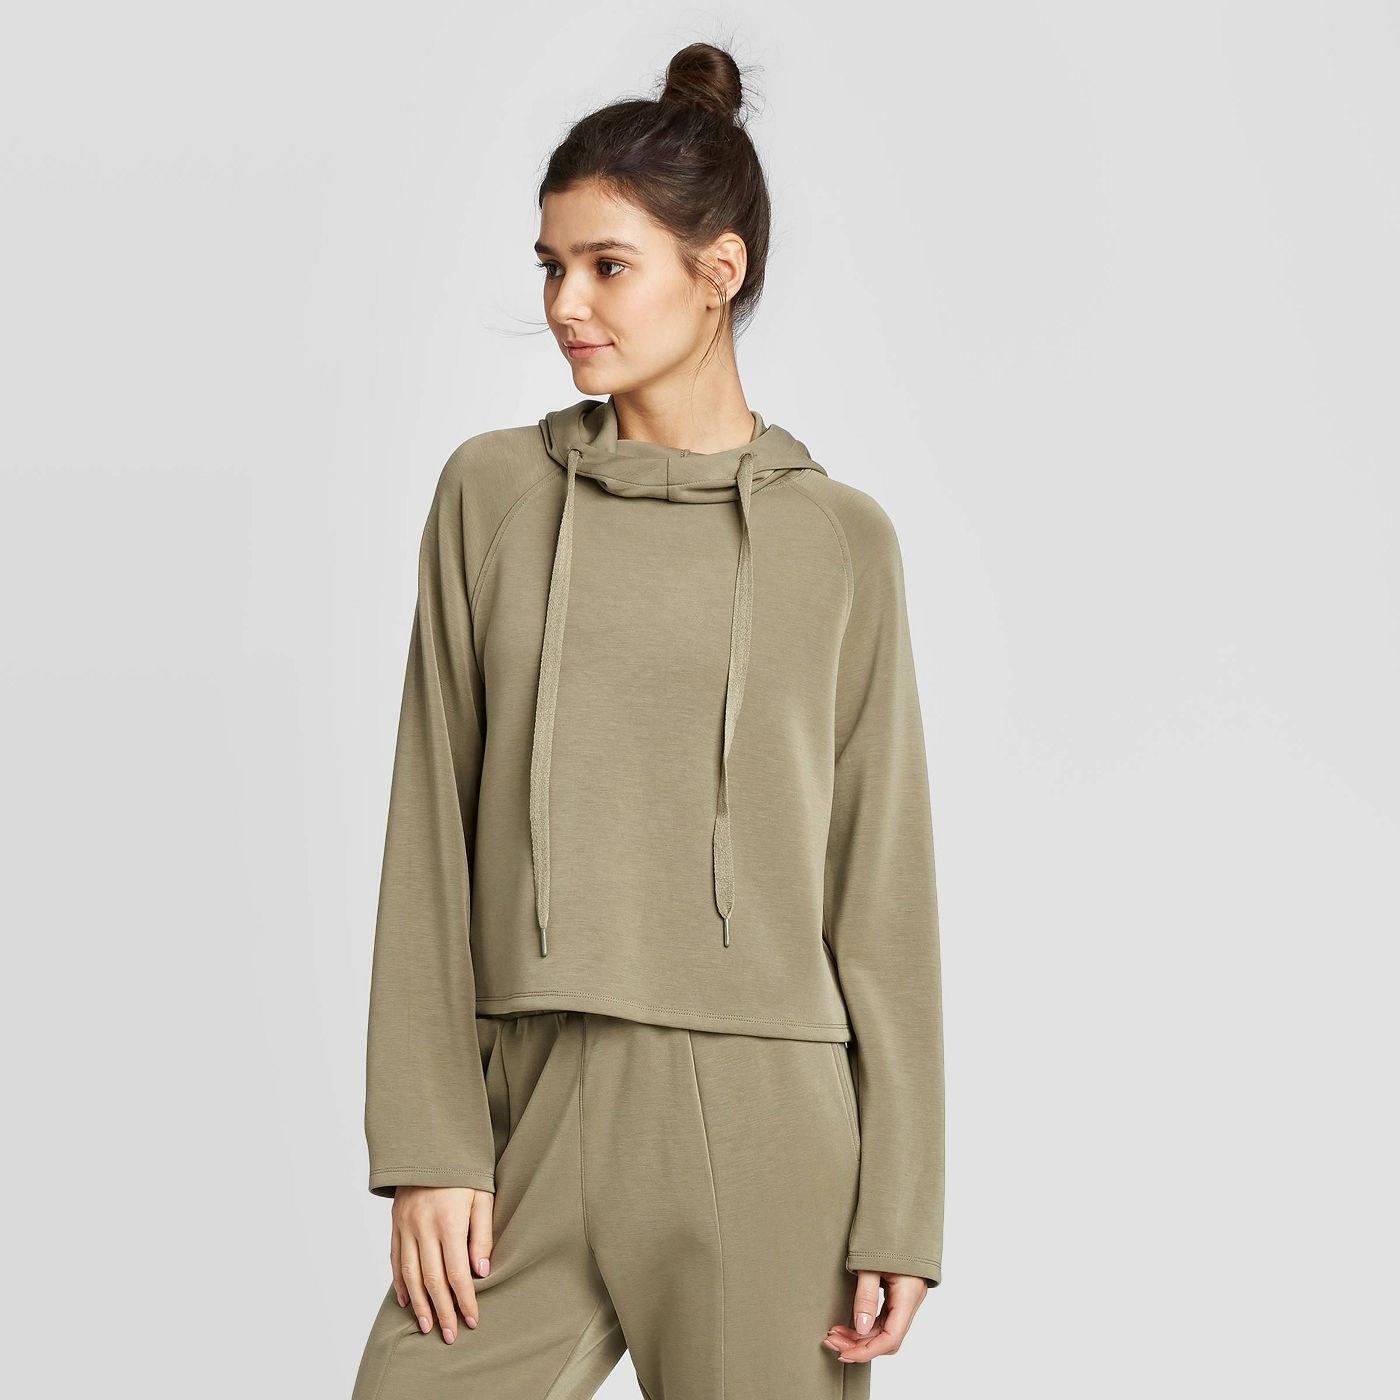 model wearing the hoodie in moss green